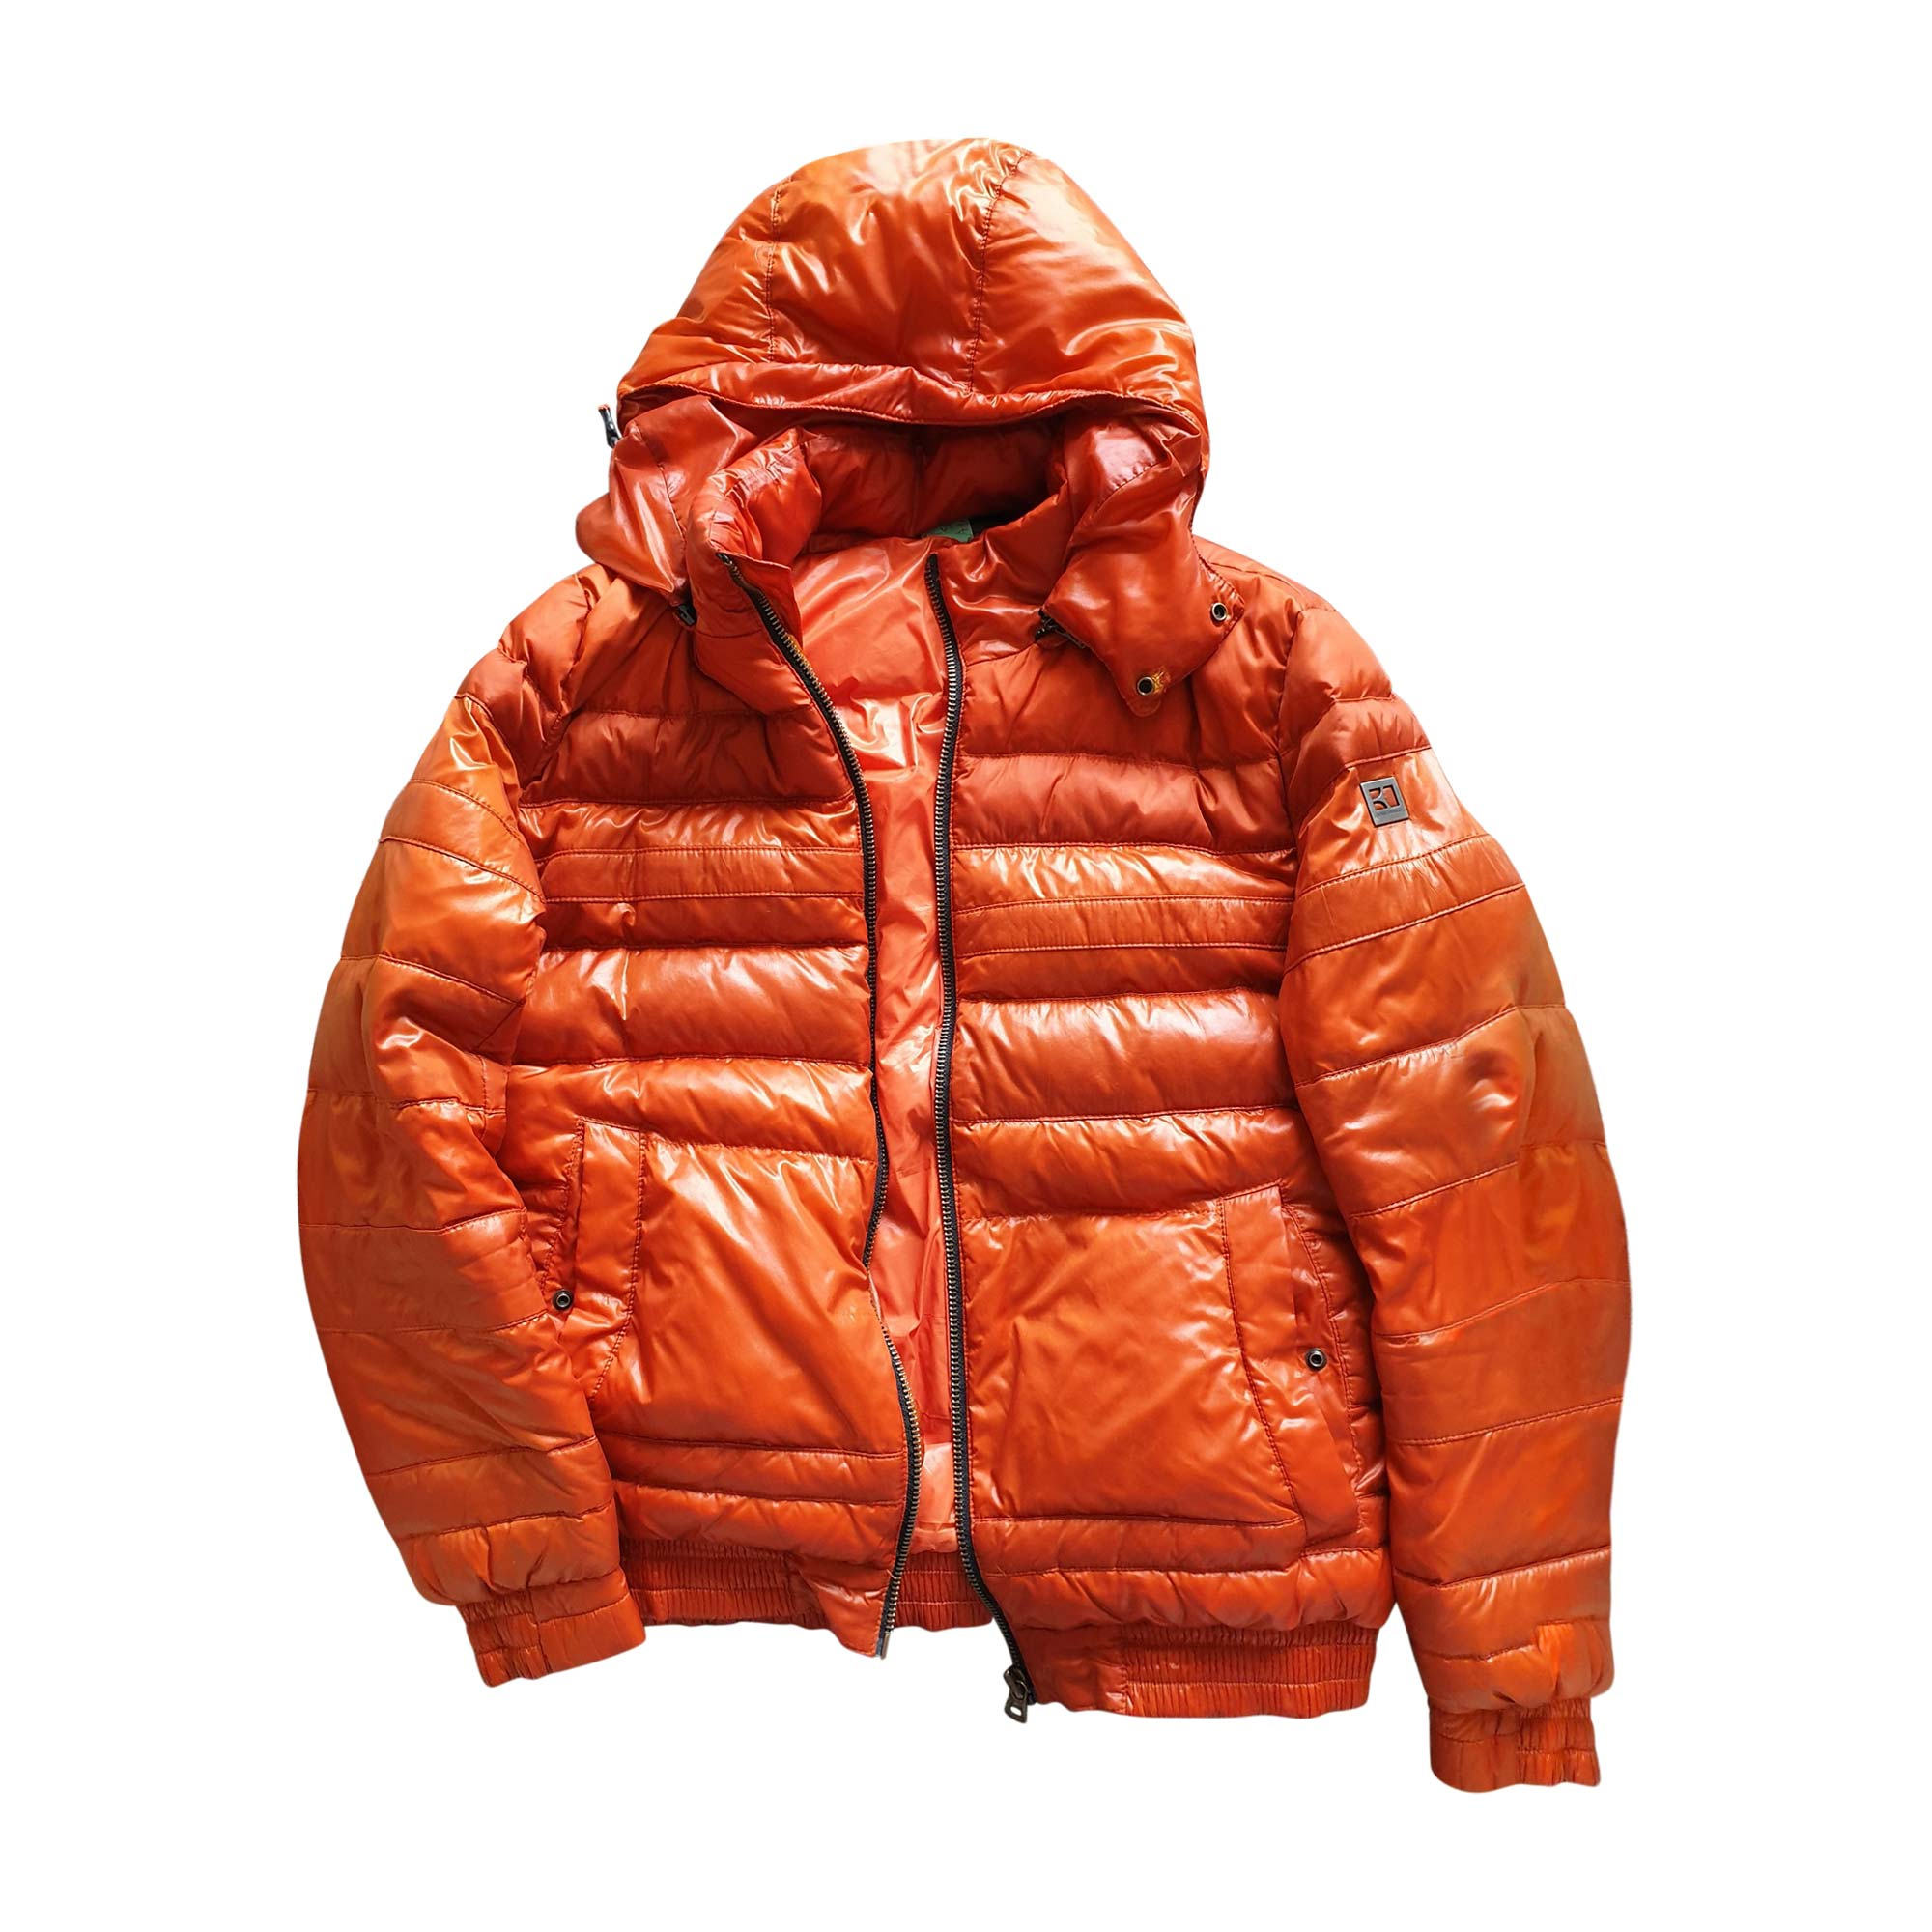 Doudoune HUGO BOSS Orange